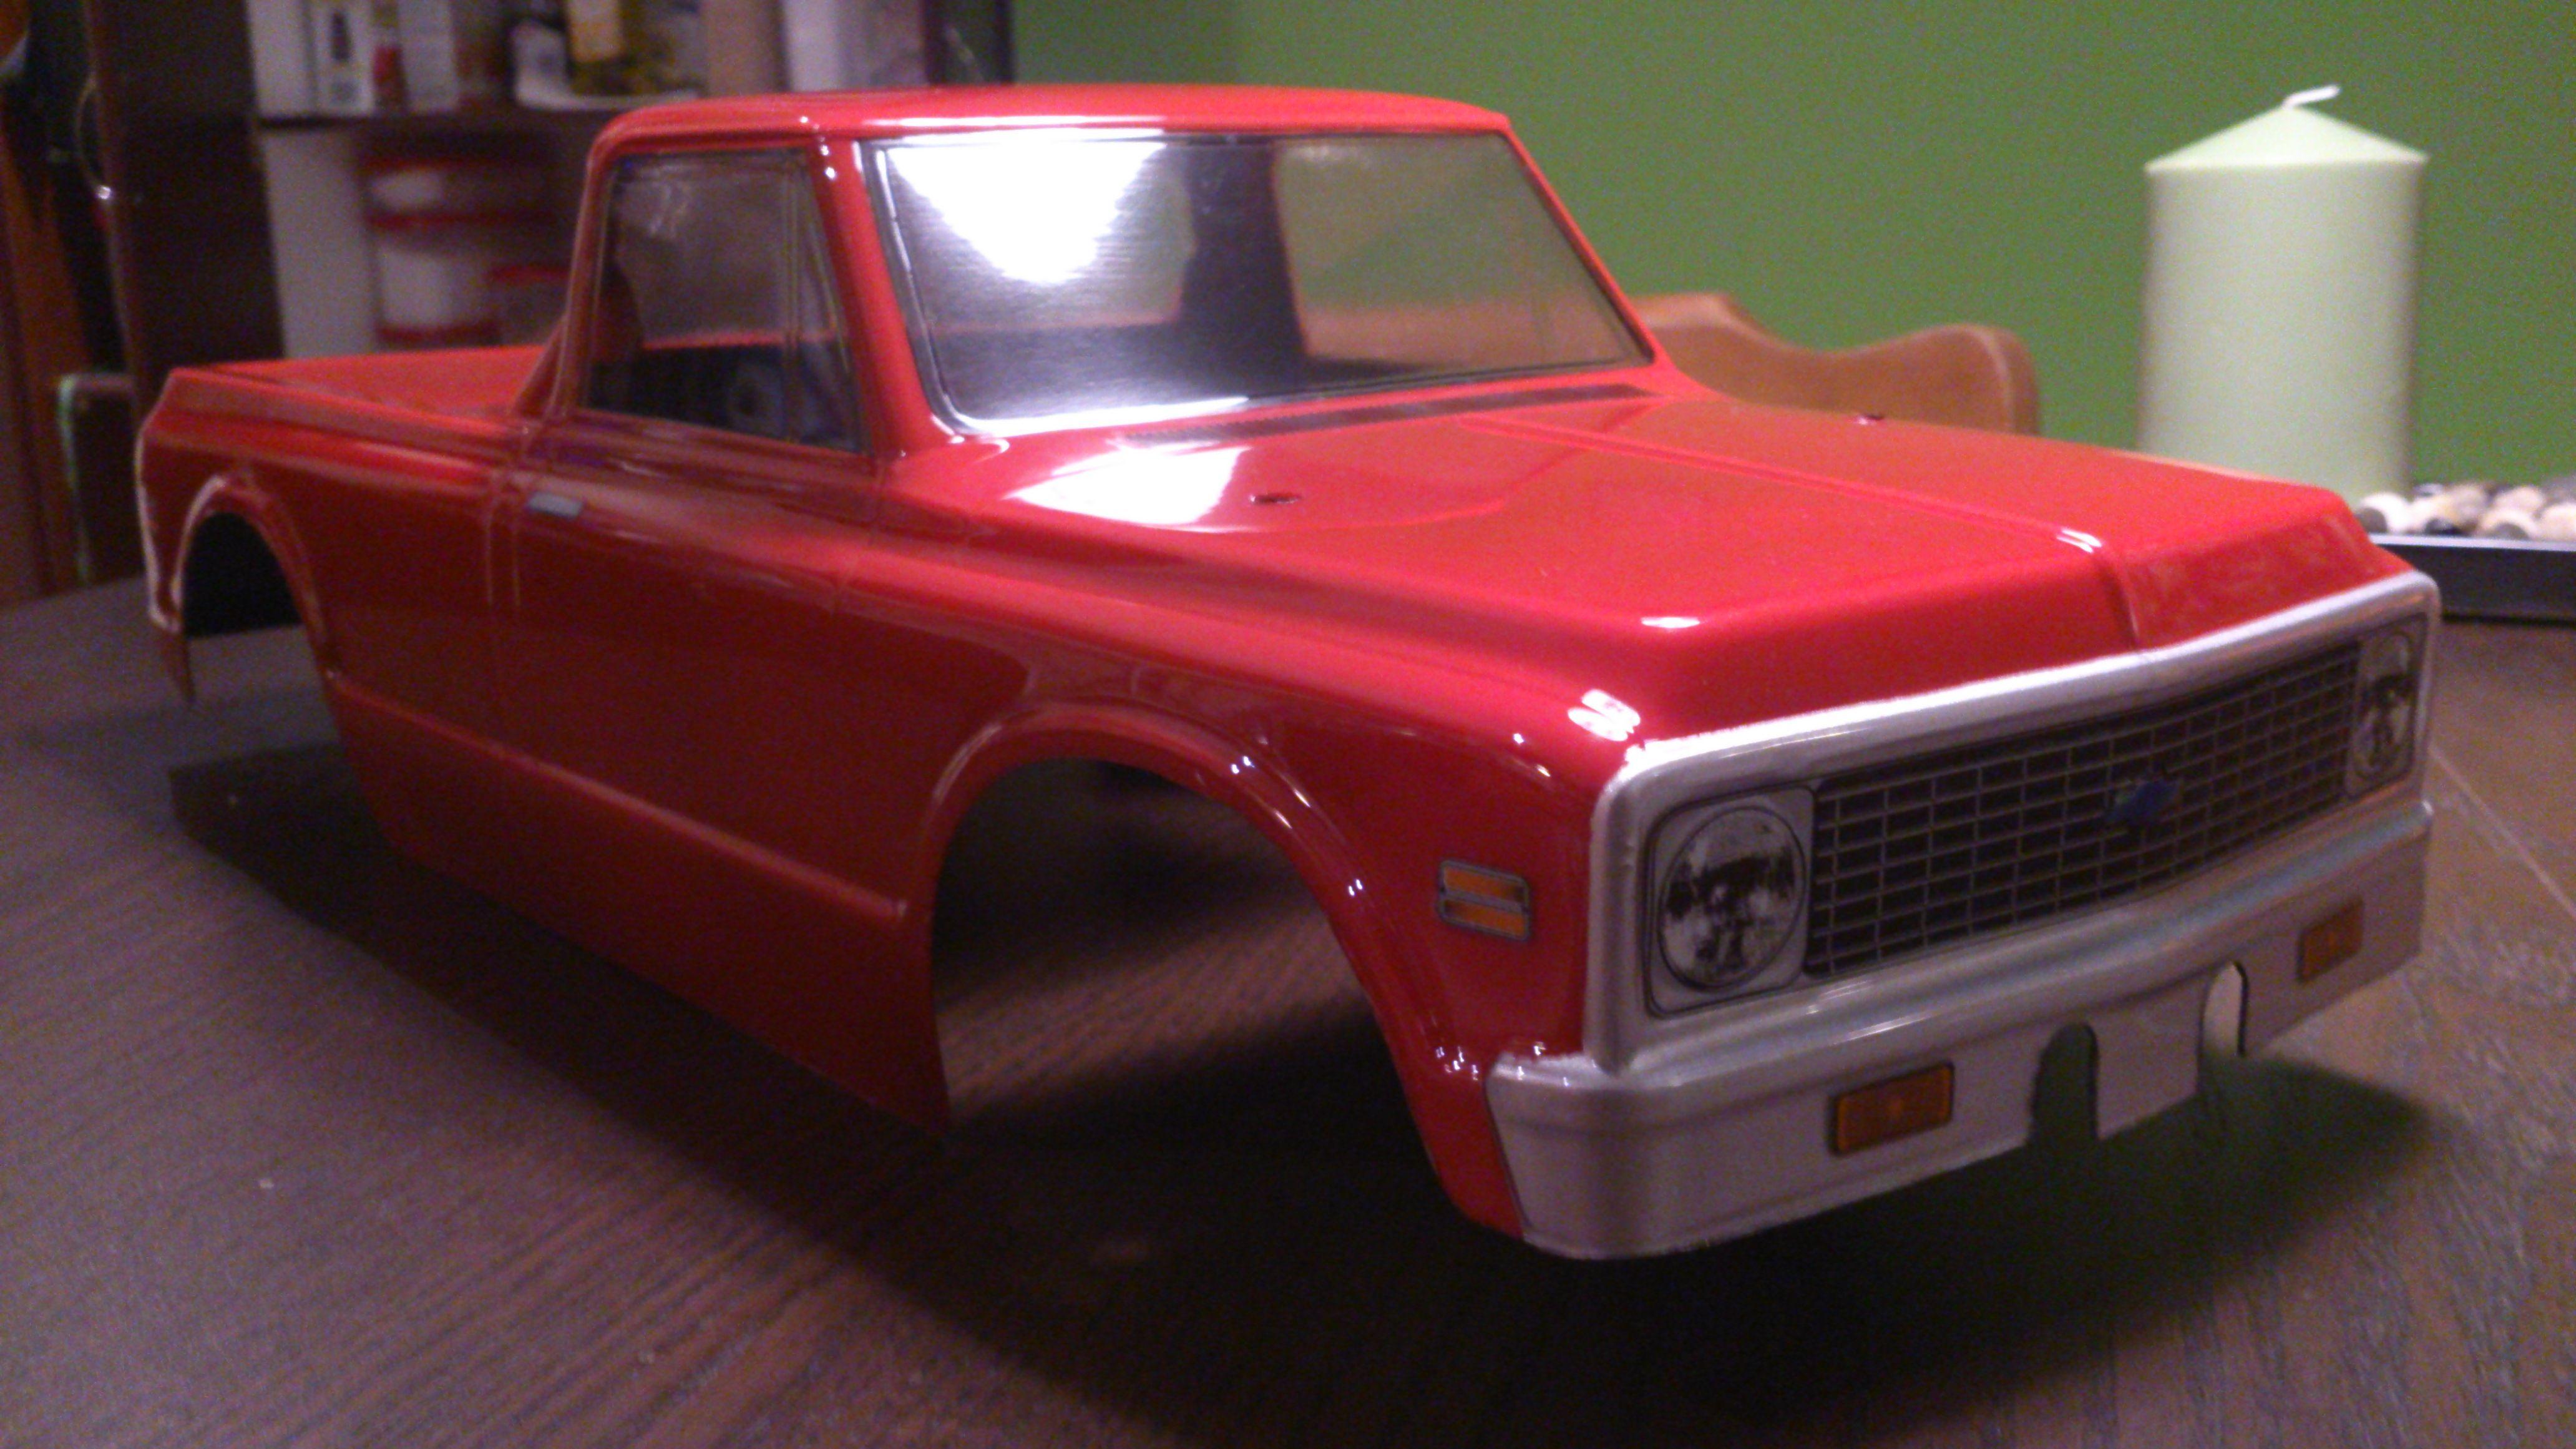 My Proline Rc body chevy c10 72 Chevy c10, Chevy, Toy car